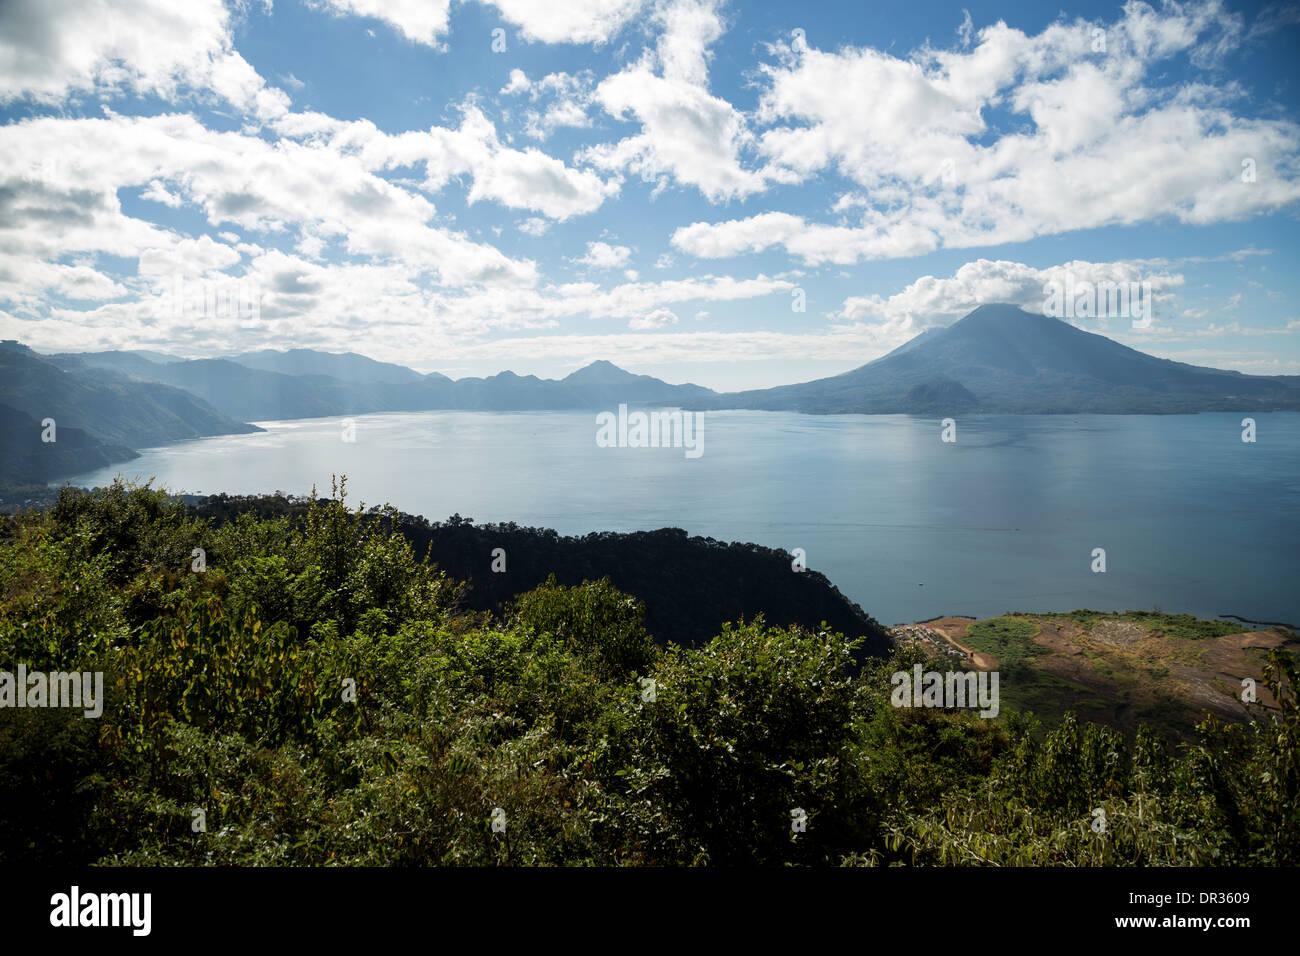 View of the lake Atitlan and volcano in Panajachel, Guatemala - Stock Image